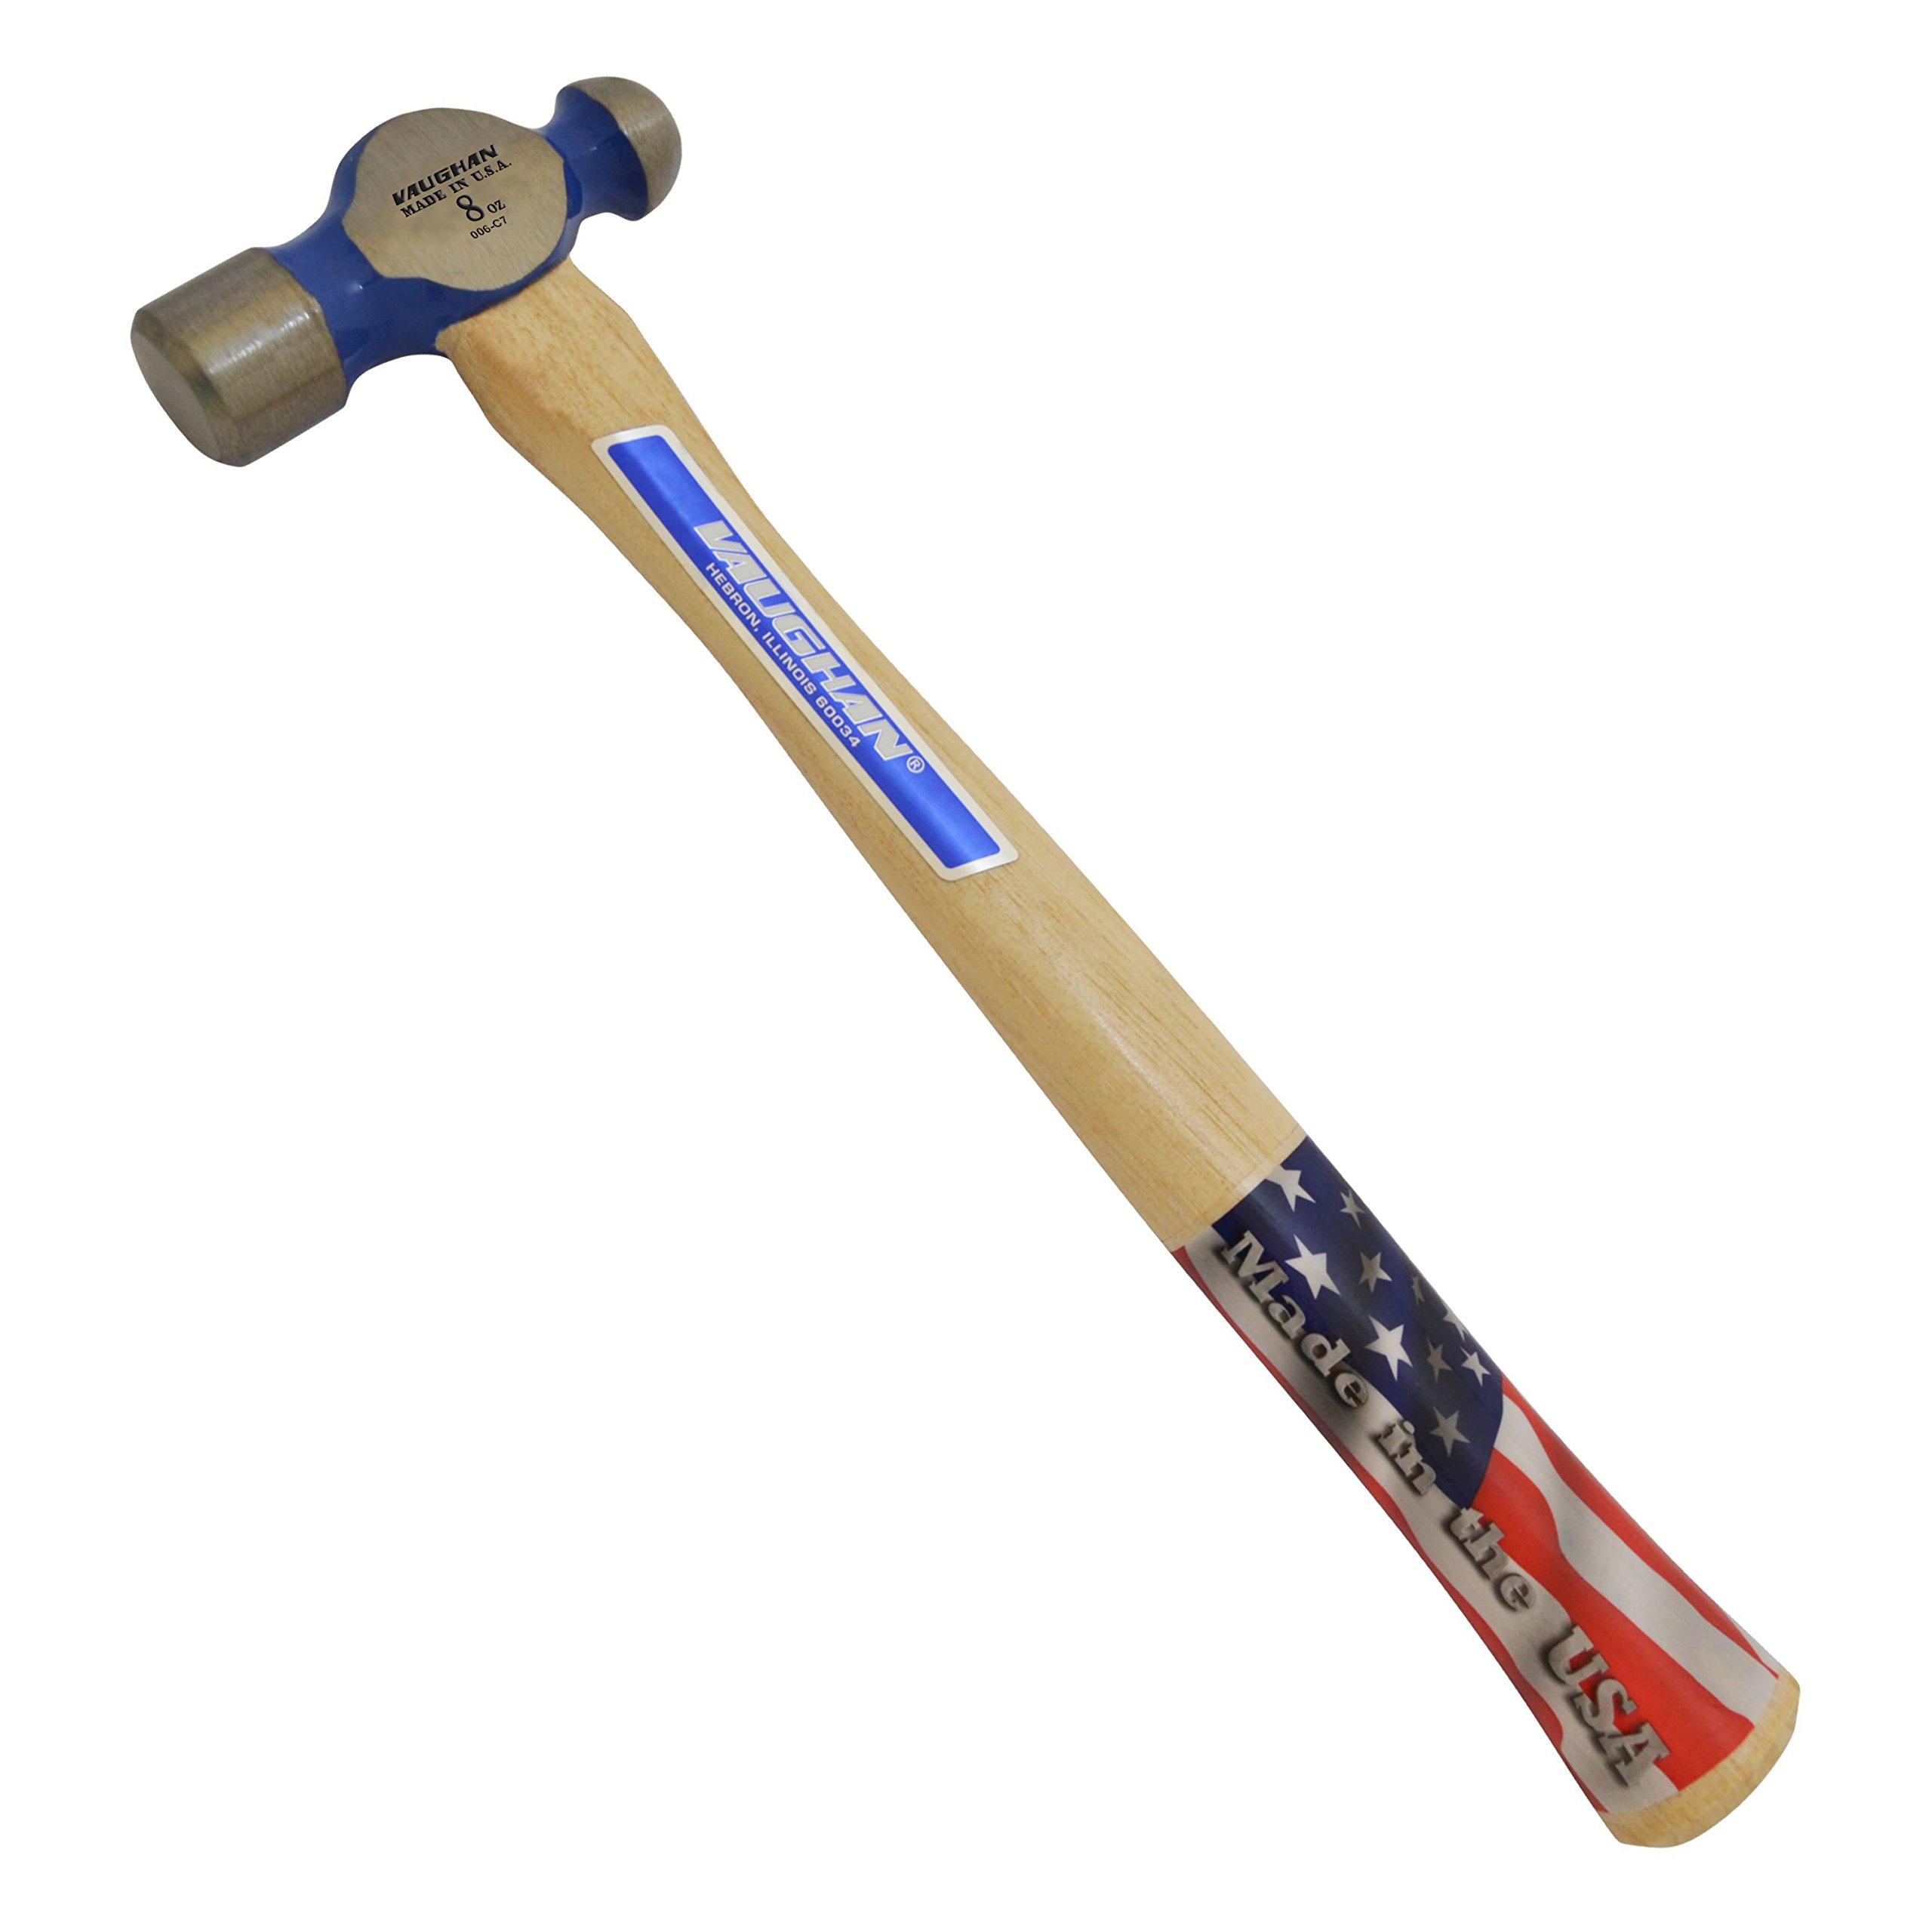 Vaughan TC308 8-Ounce Commercial Ball Pein Hammer